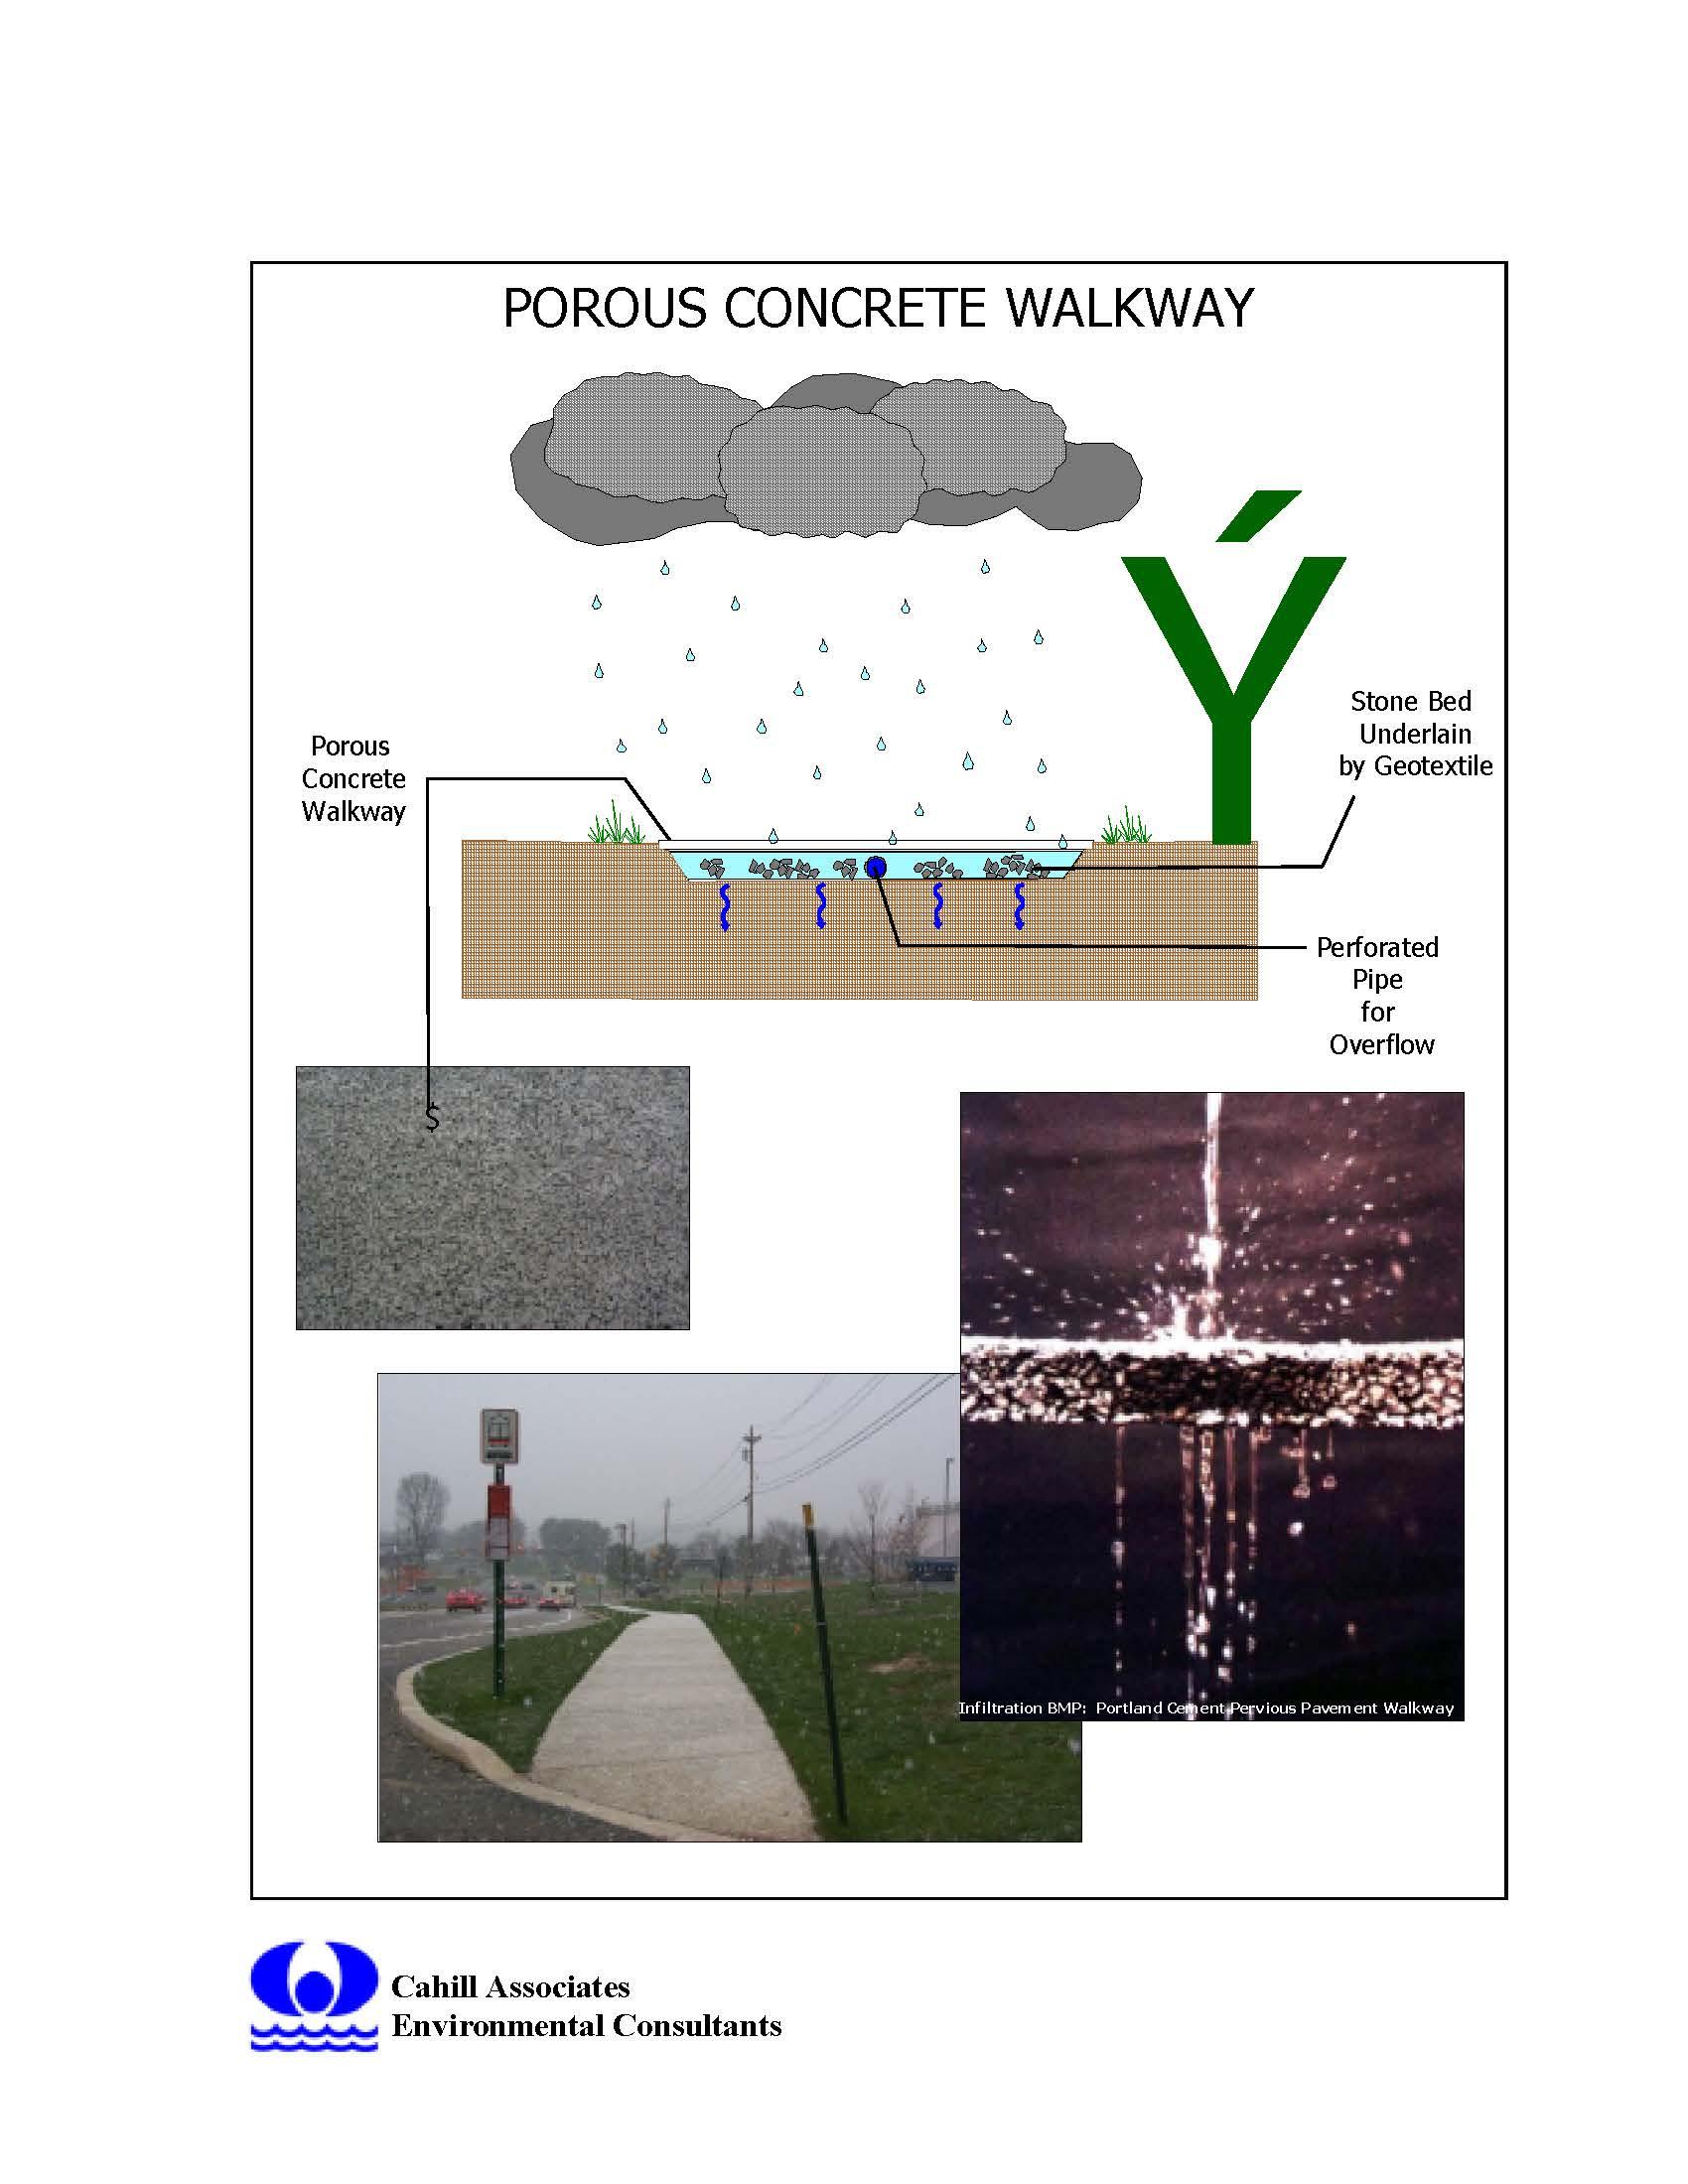 Porous Concrete Walkway